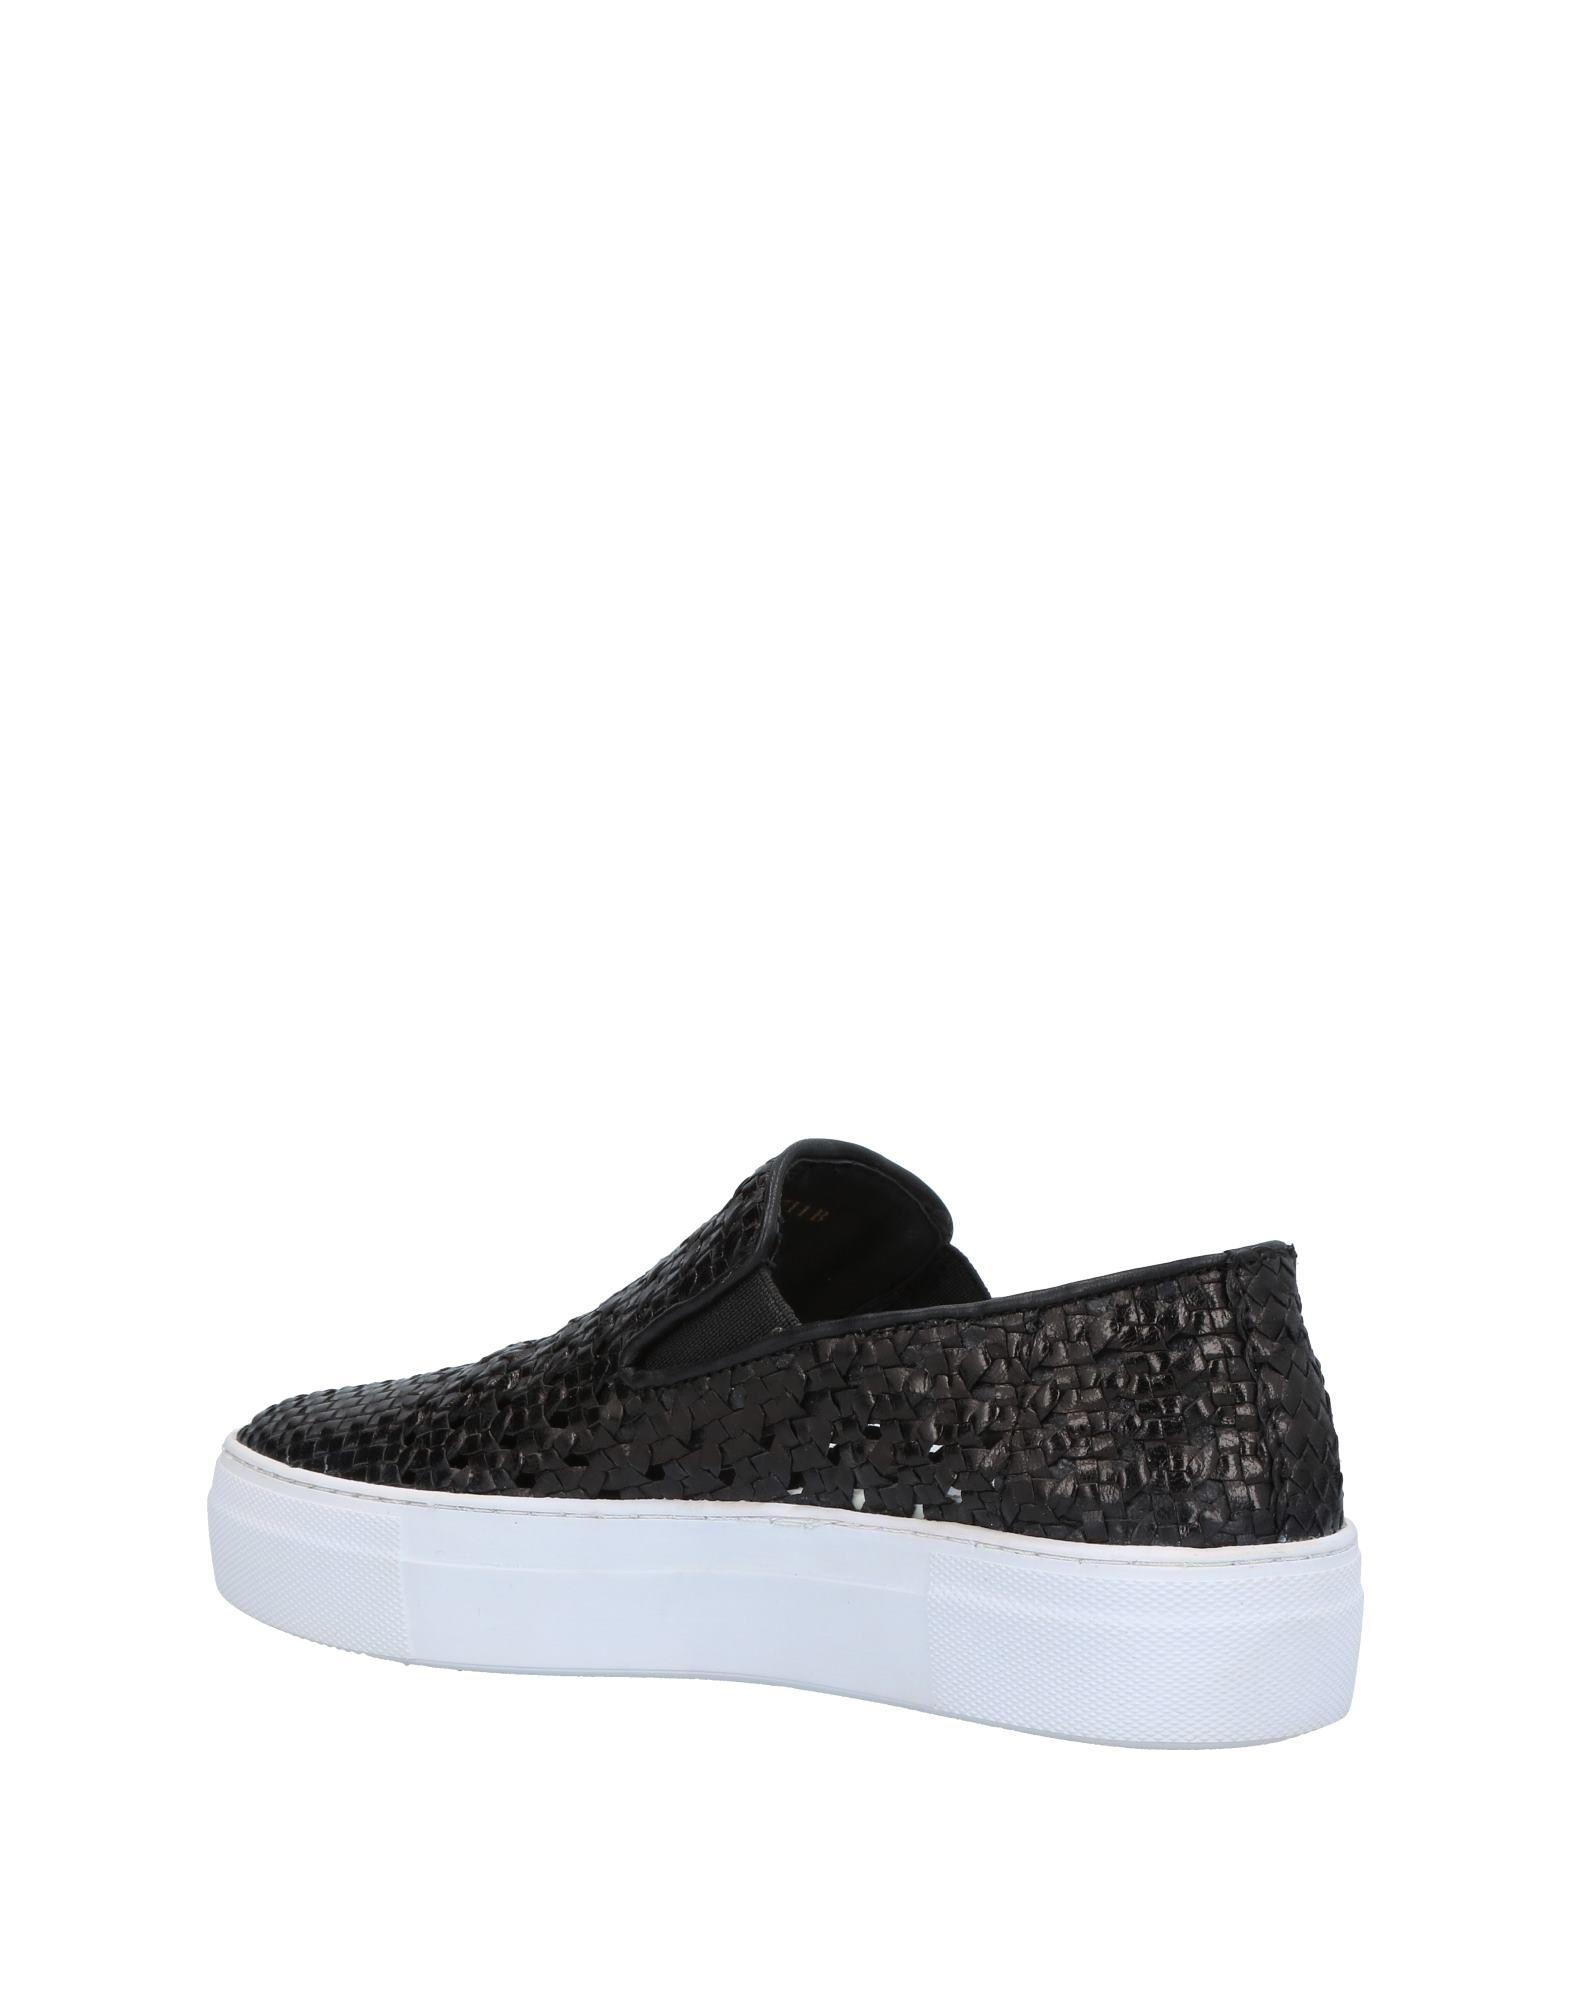 Sneakers Ma & Lo Femme - Sneakers Ma & Lo sur